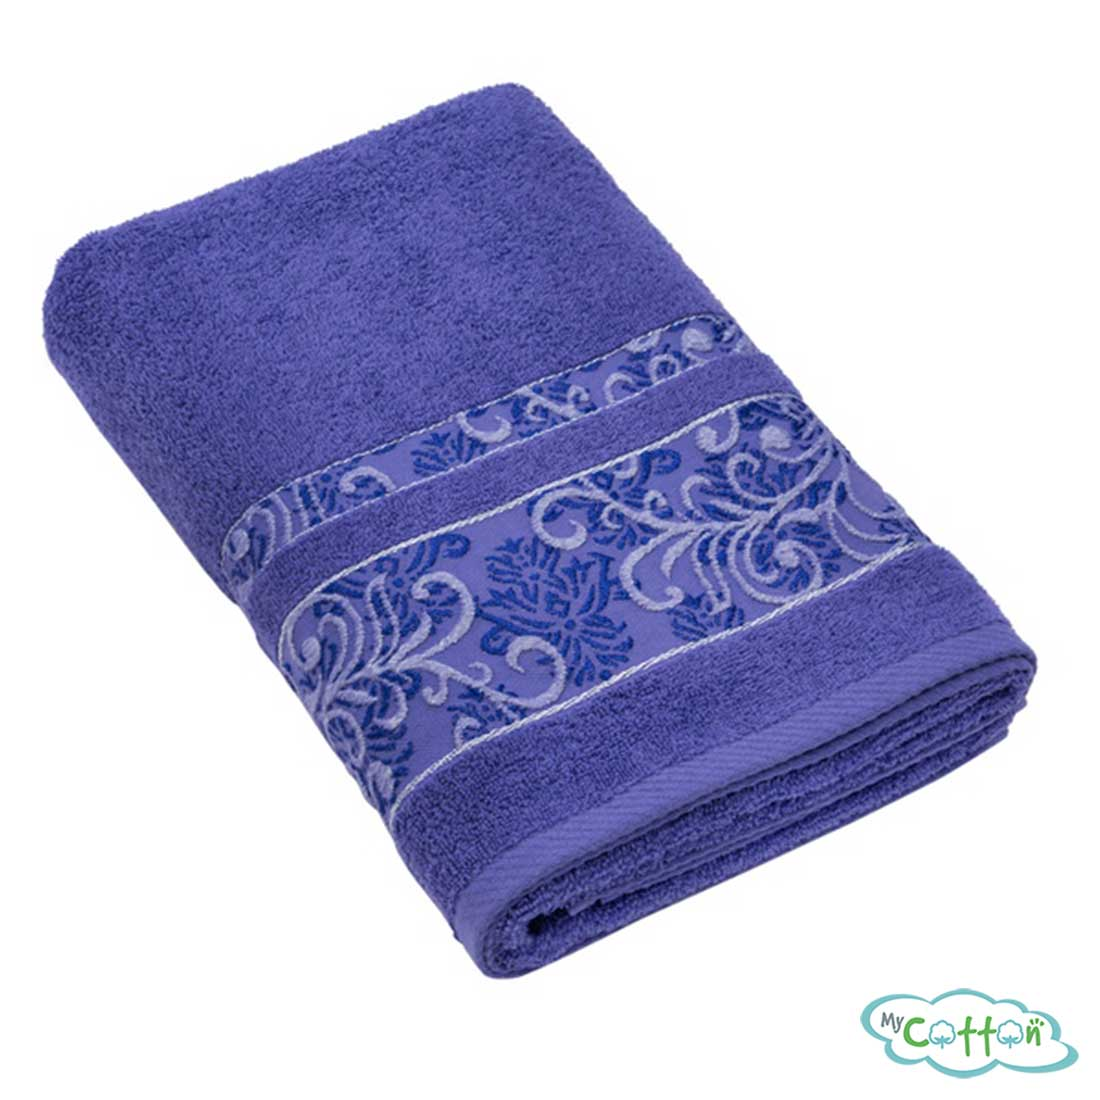 Полотенце махровое BRIELLEпурпурное с вышивкой